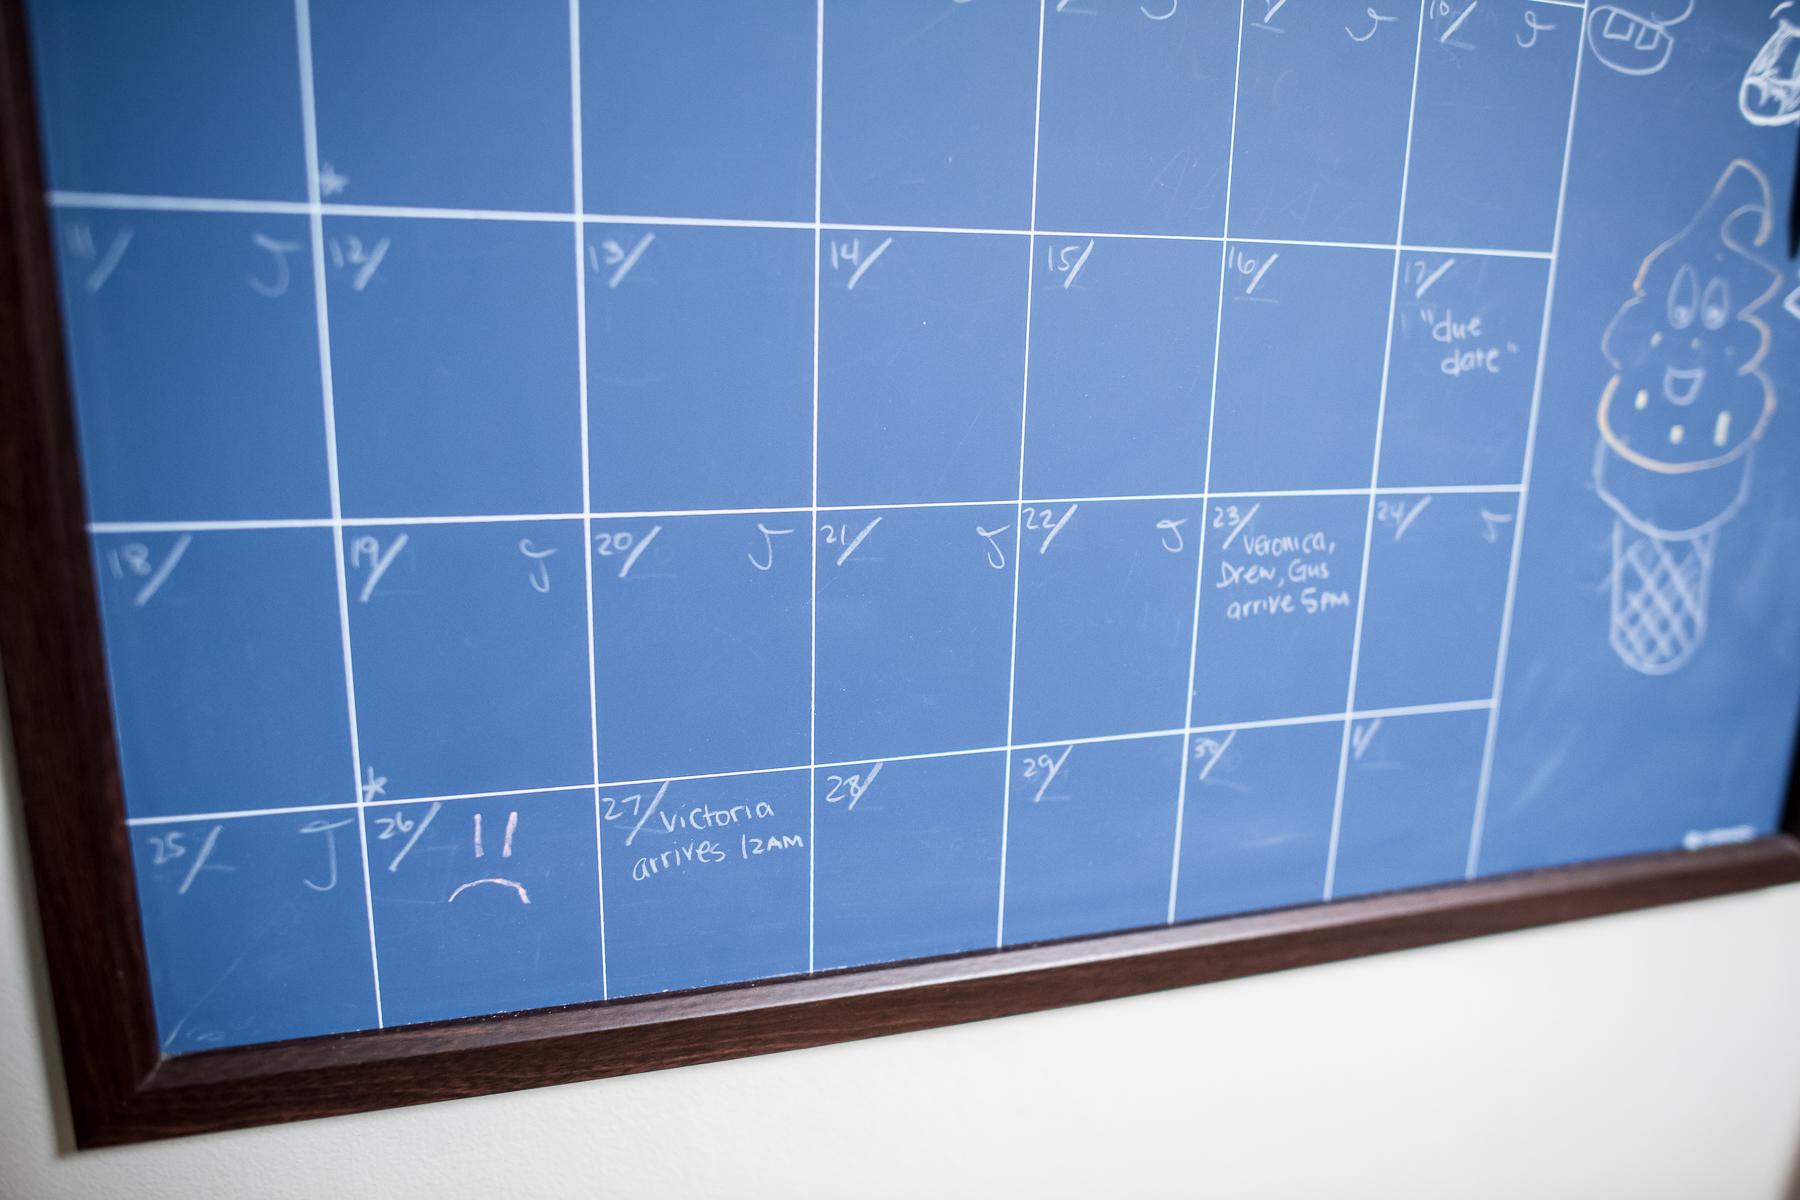 due-date-homebirth